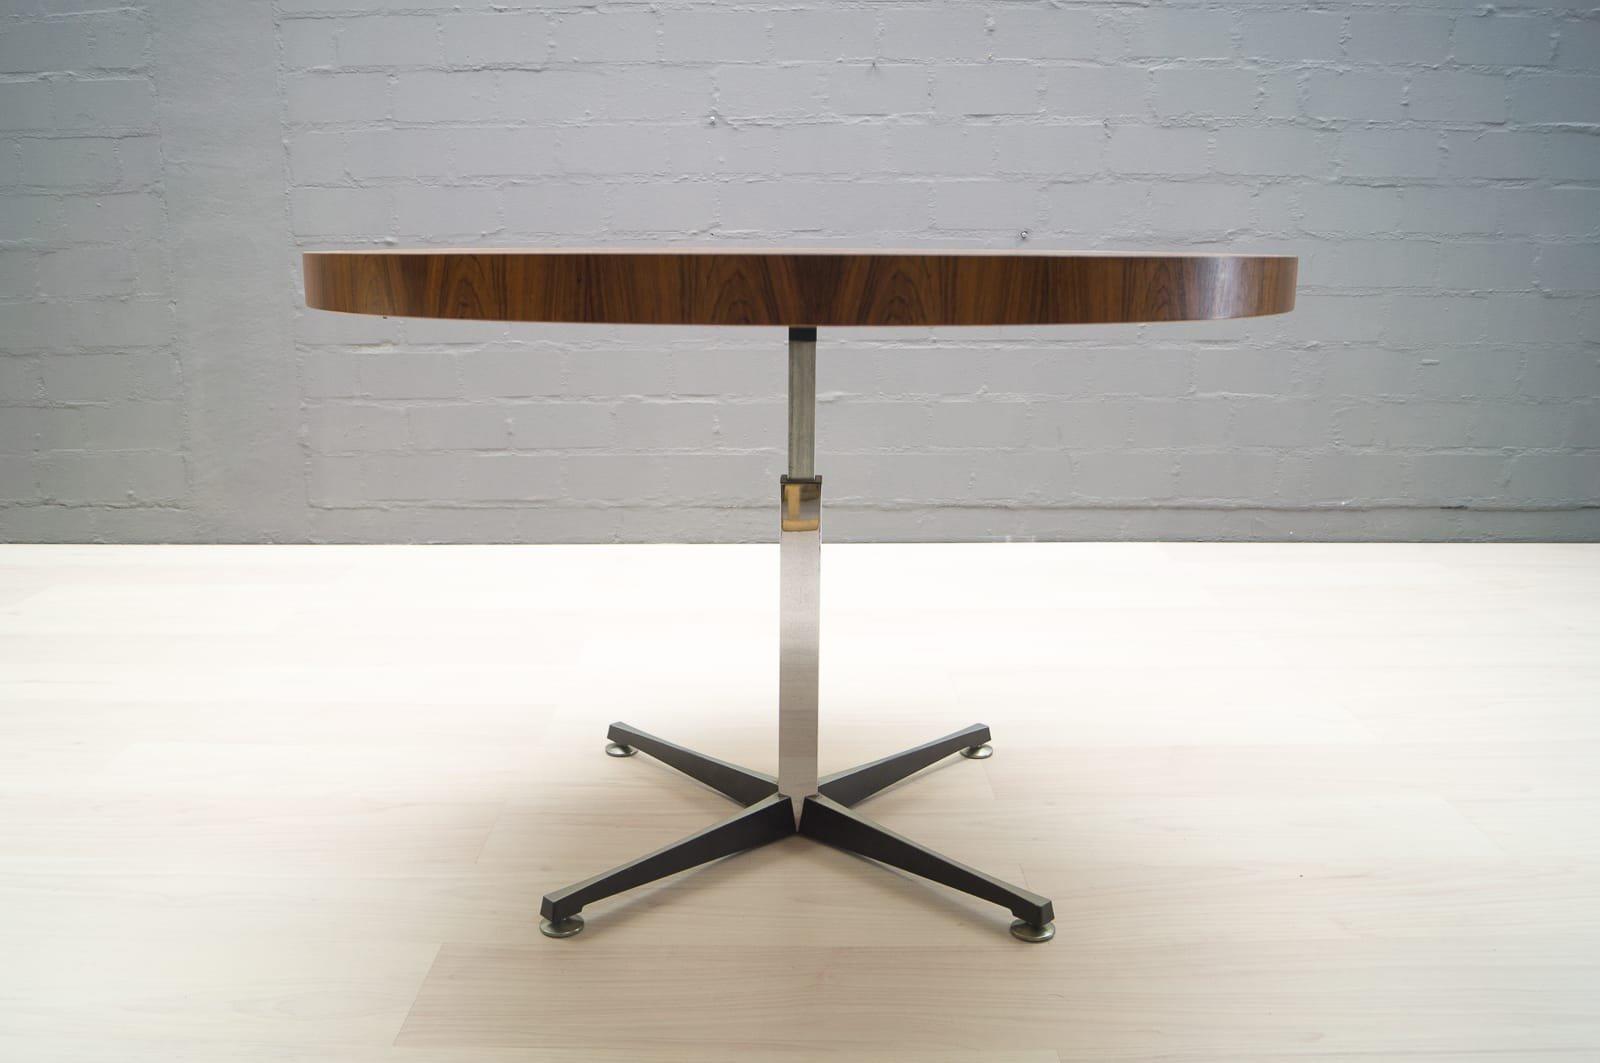 Altezza tavoli da pranzo good altezza tavoli da pranzo for Altezza tavolo pranzo